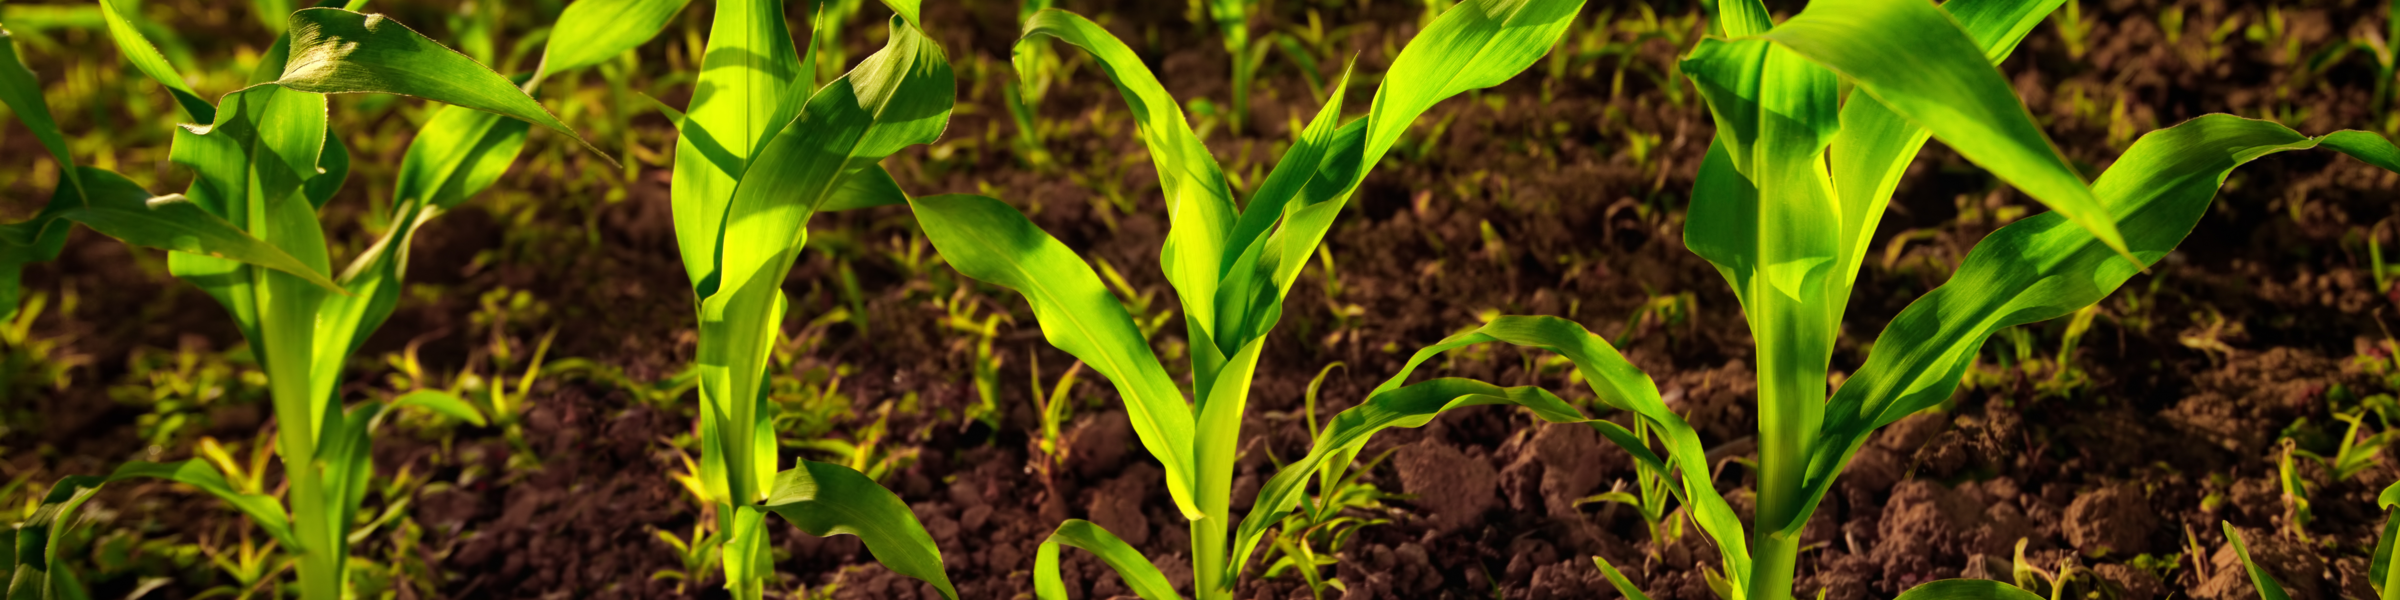 Corn Spring Subpage